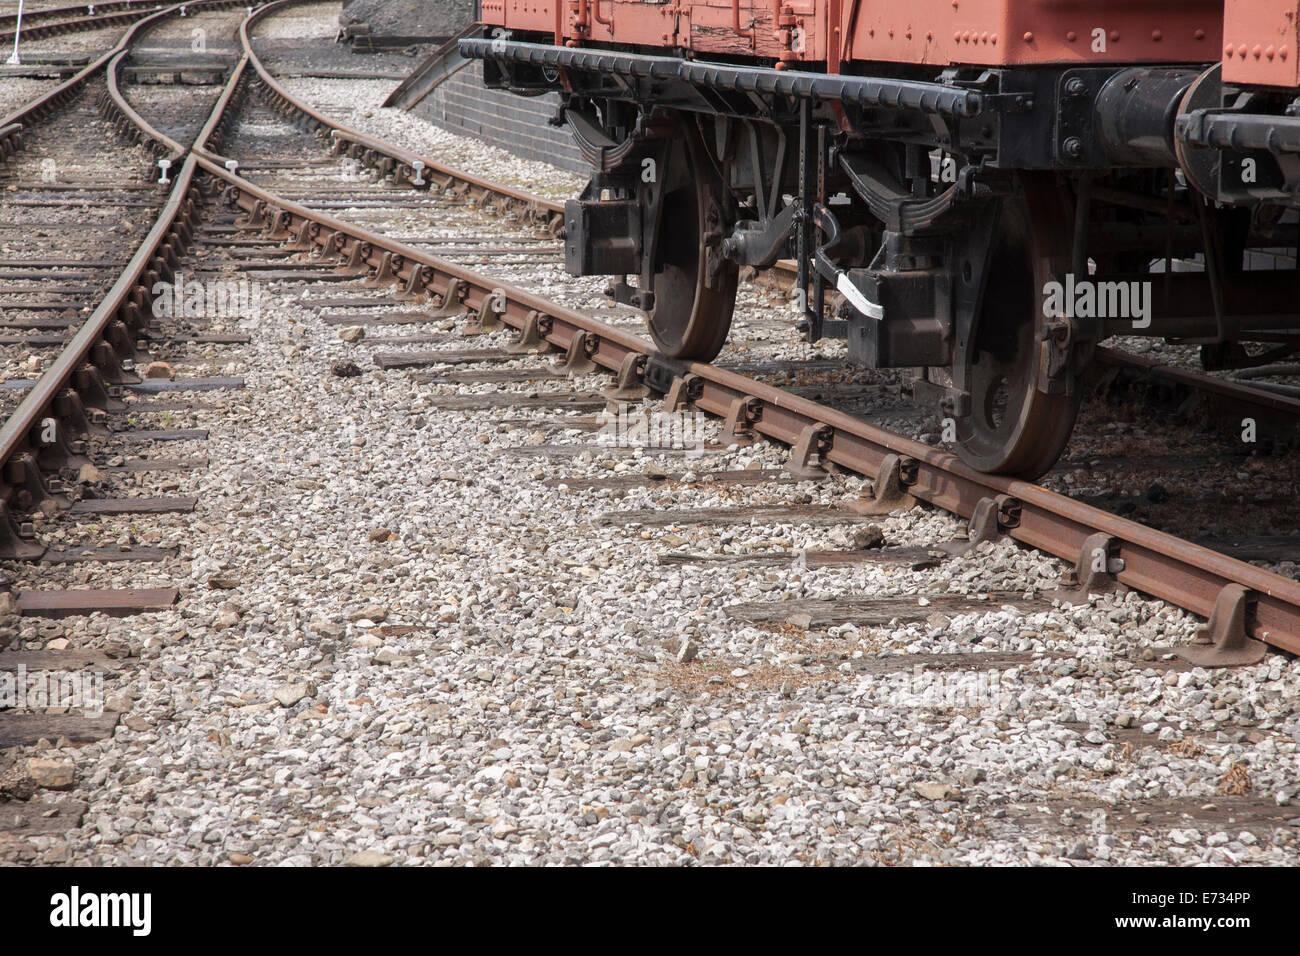 railway track background in urban setting stock photo 73213694 alamy